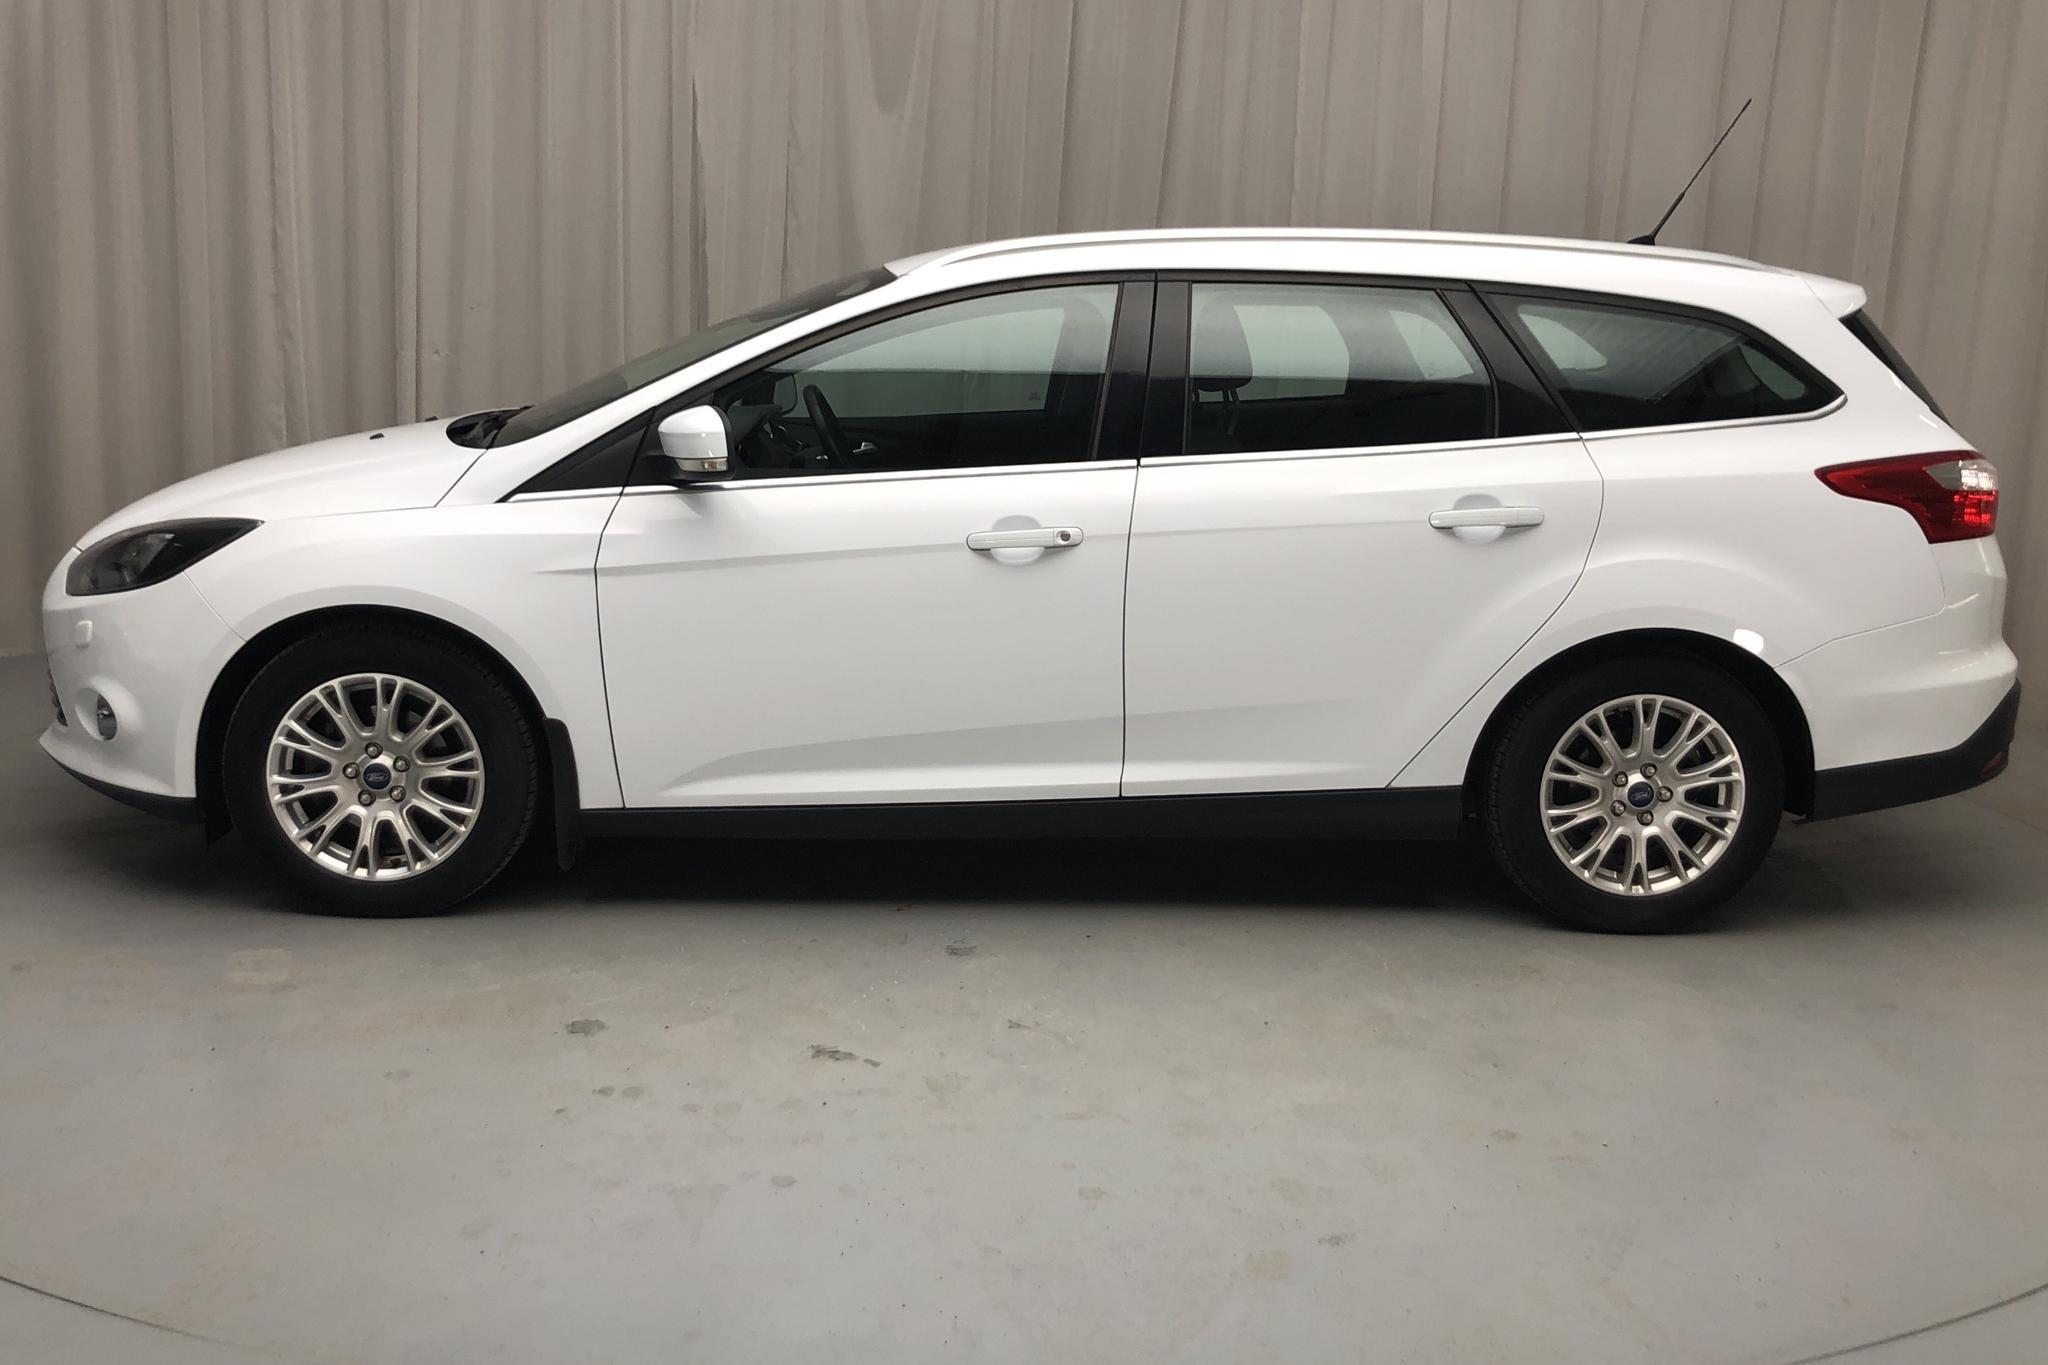 Ford Focus 1.6 TDCi Kombi (115hk) - 13 401 mil - Manuell - vit - 2011